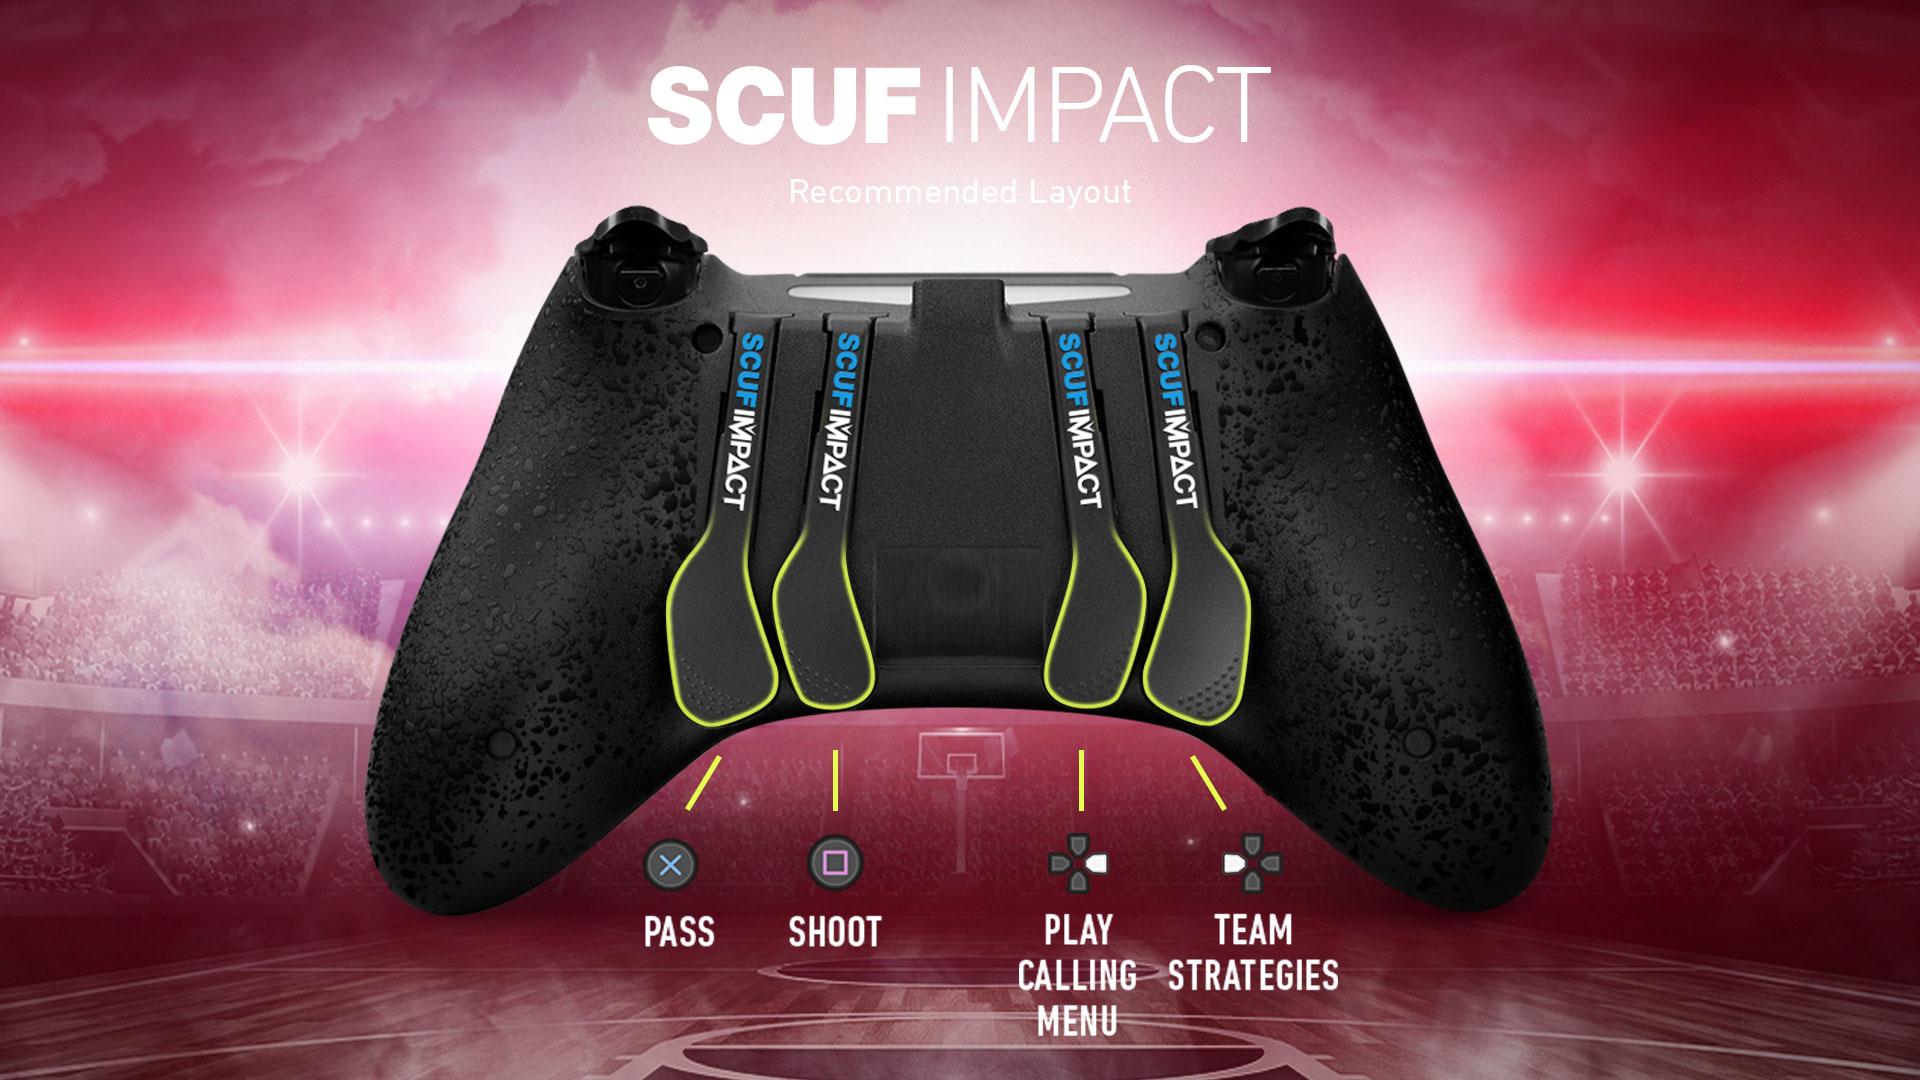 SCUF IMPACT NBA 2K20 Controller Configuration